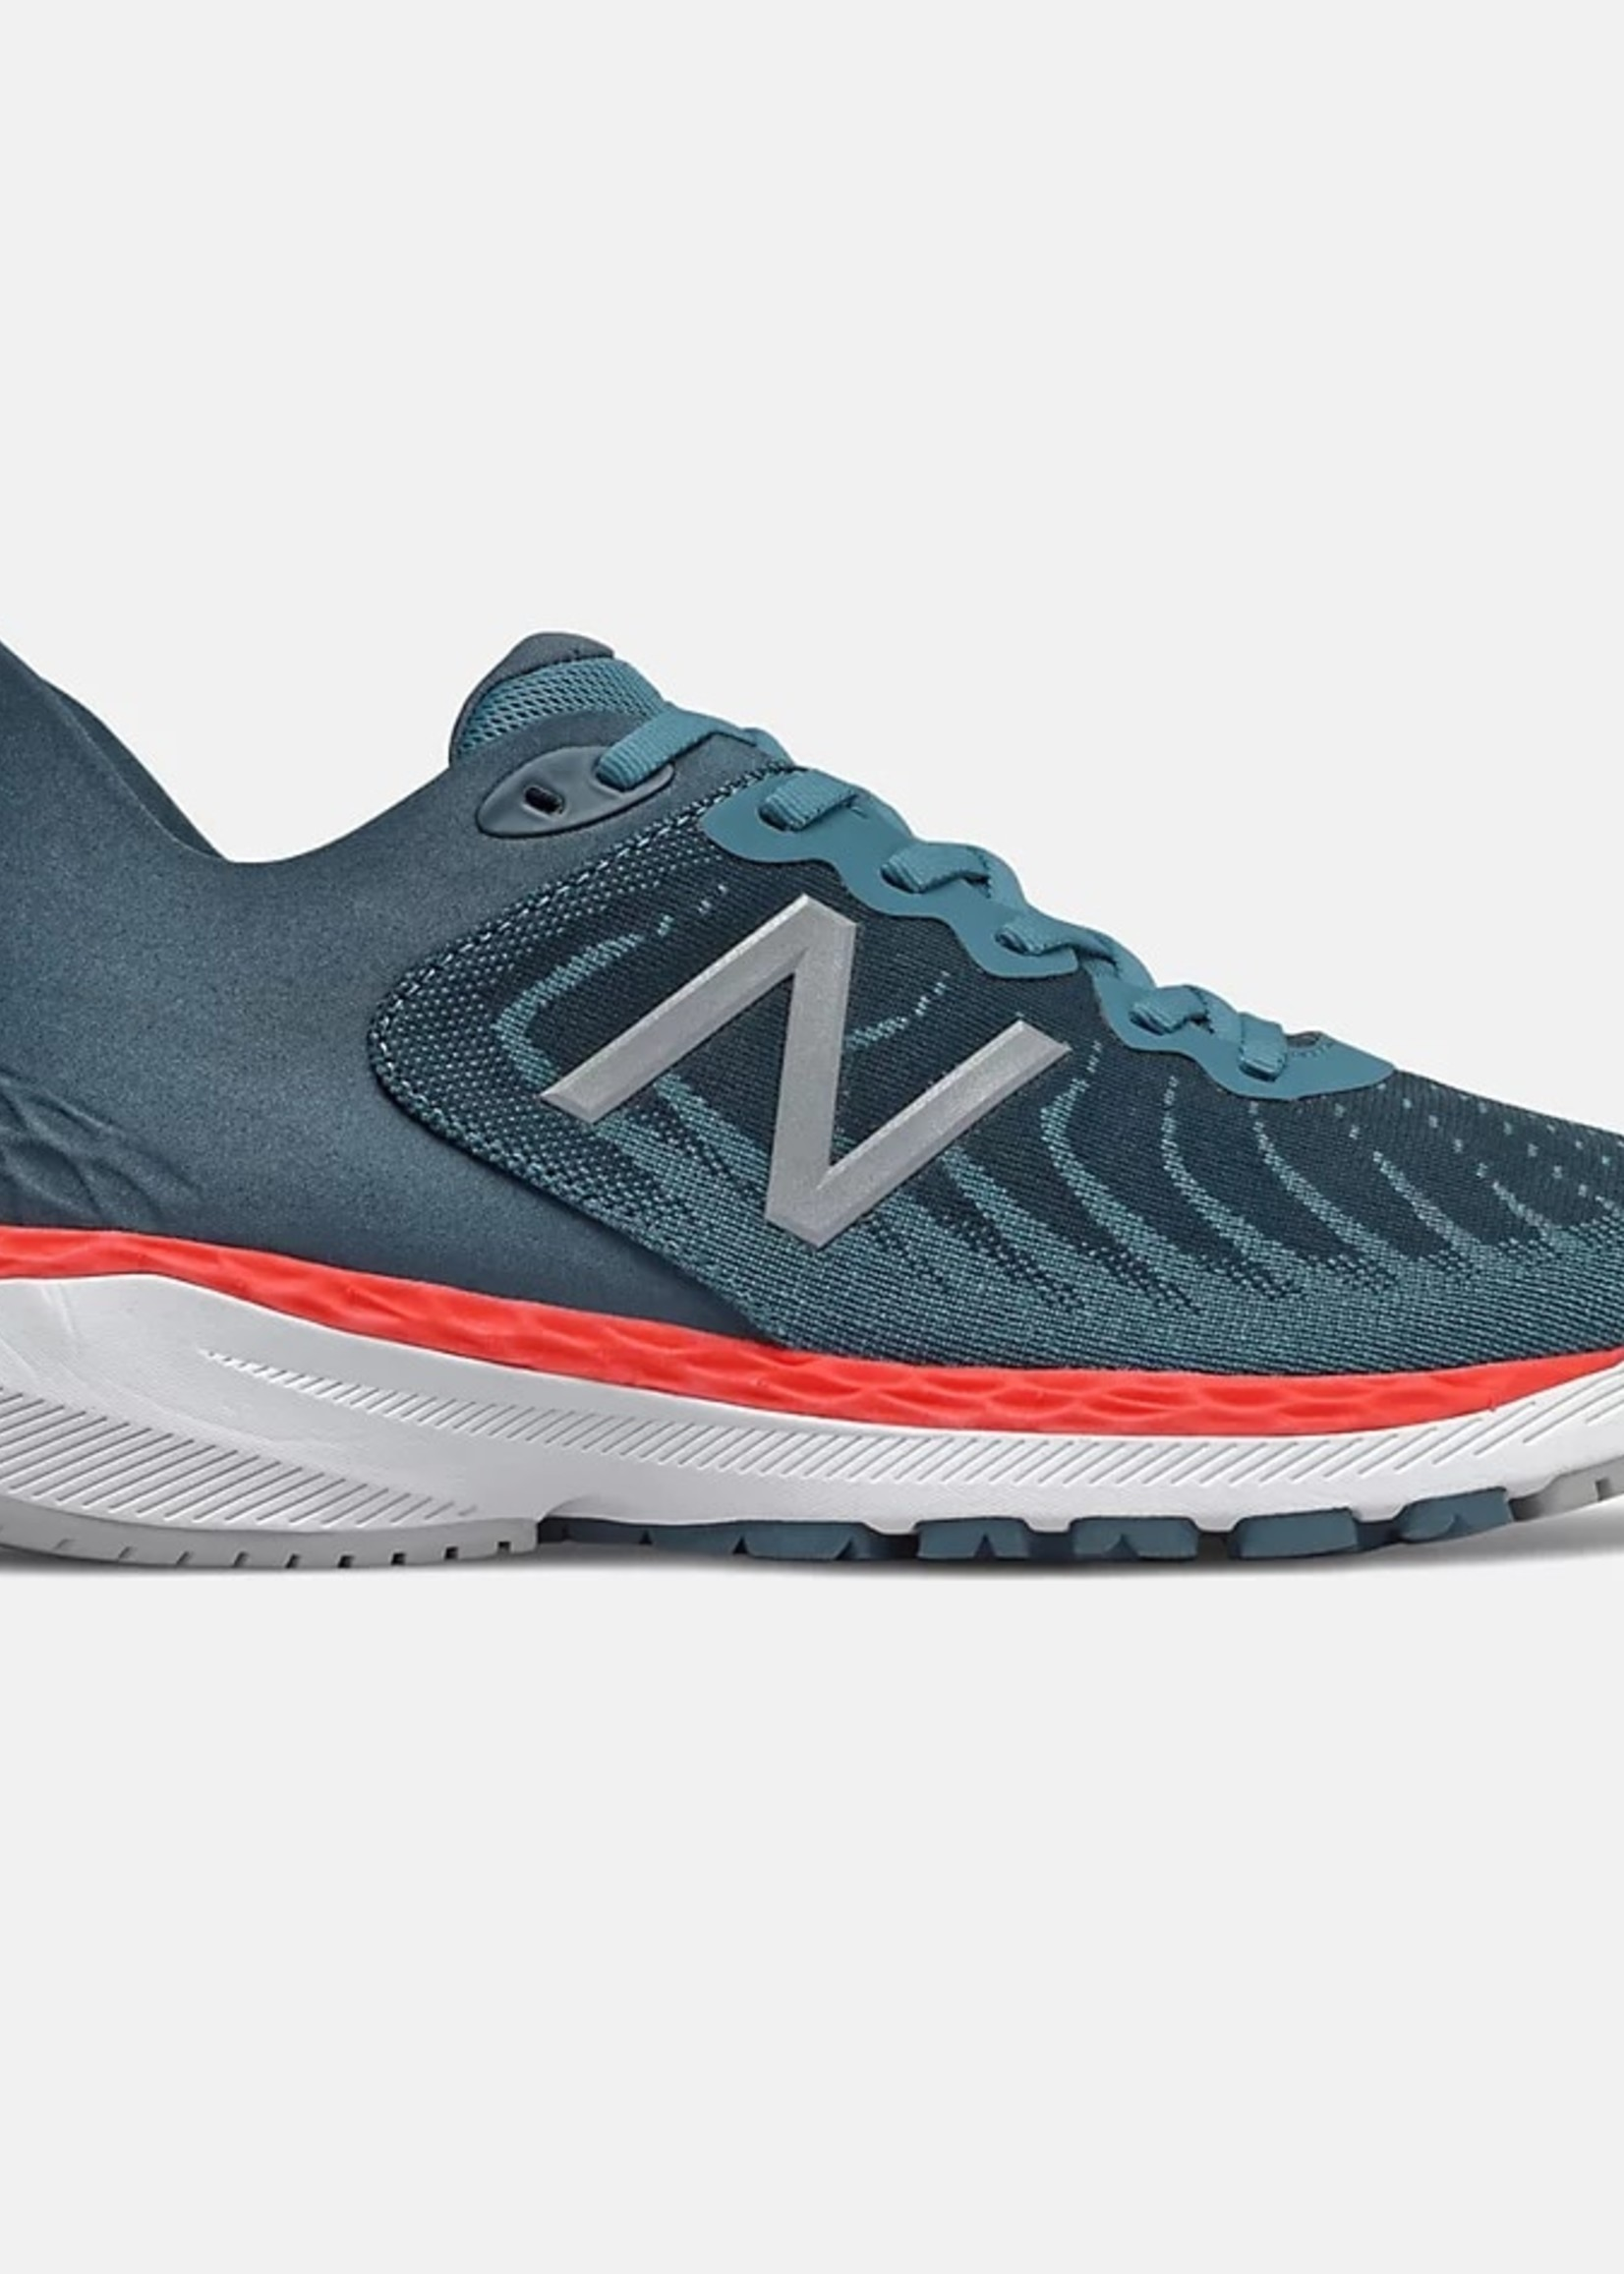 New Balance New Balance 860v11 Wide (2E)